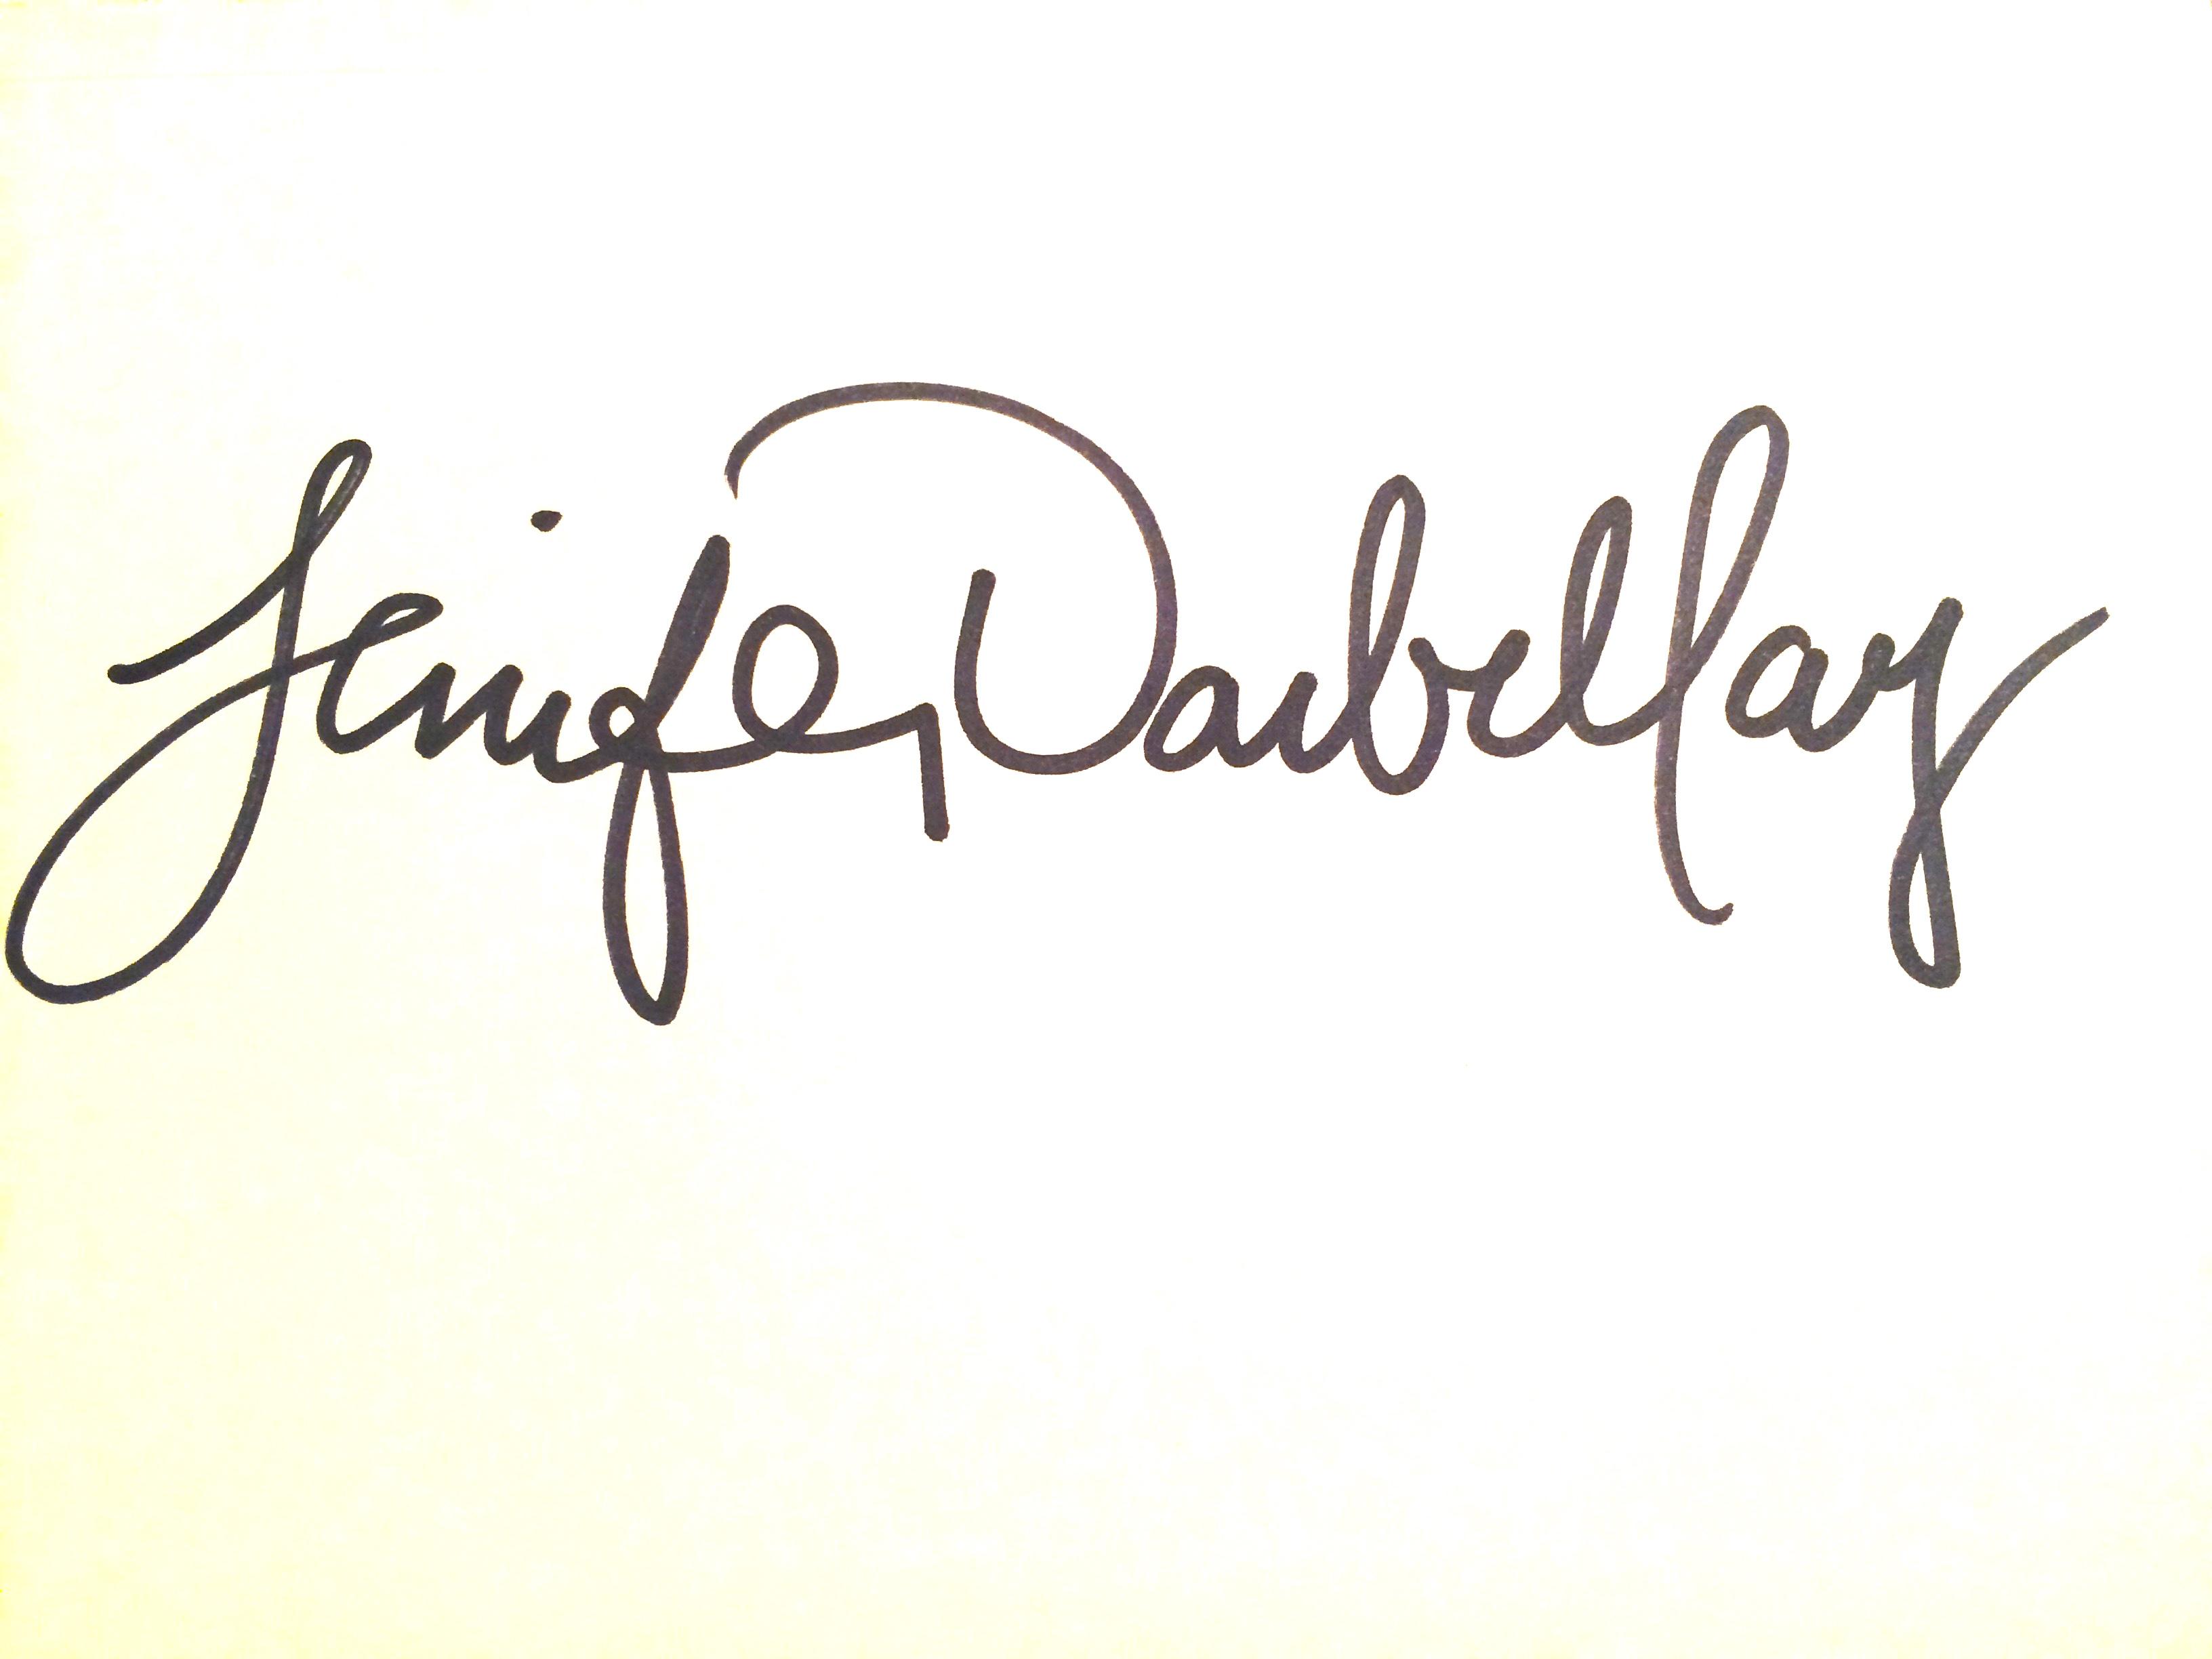 Jenifer Darbellay's Signature